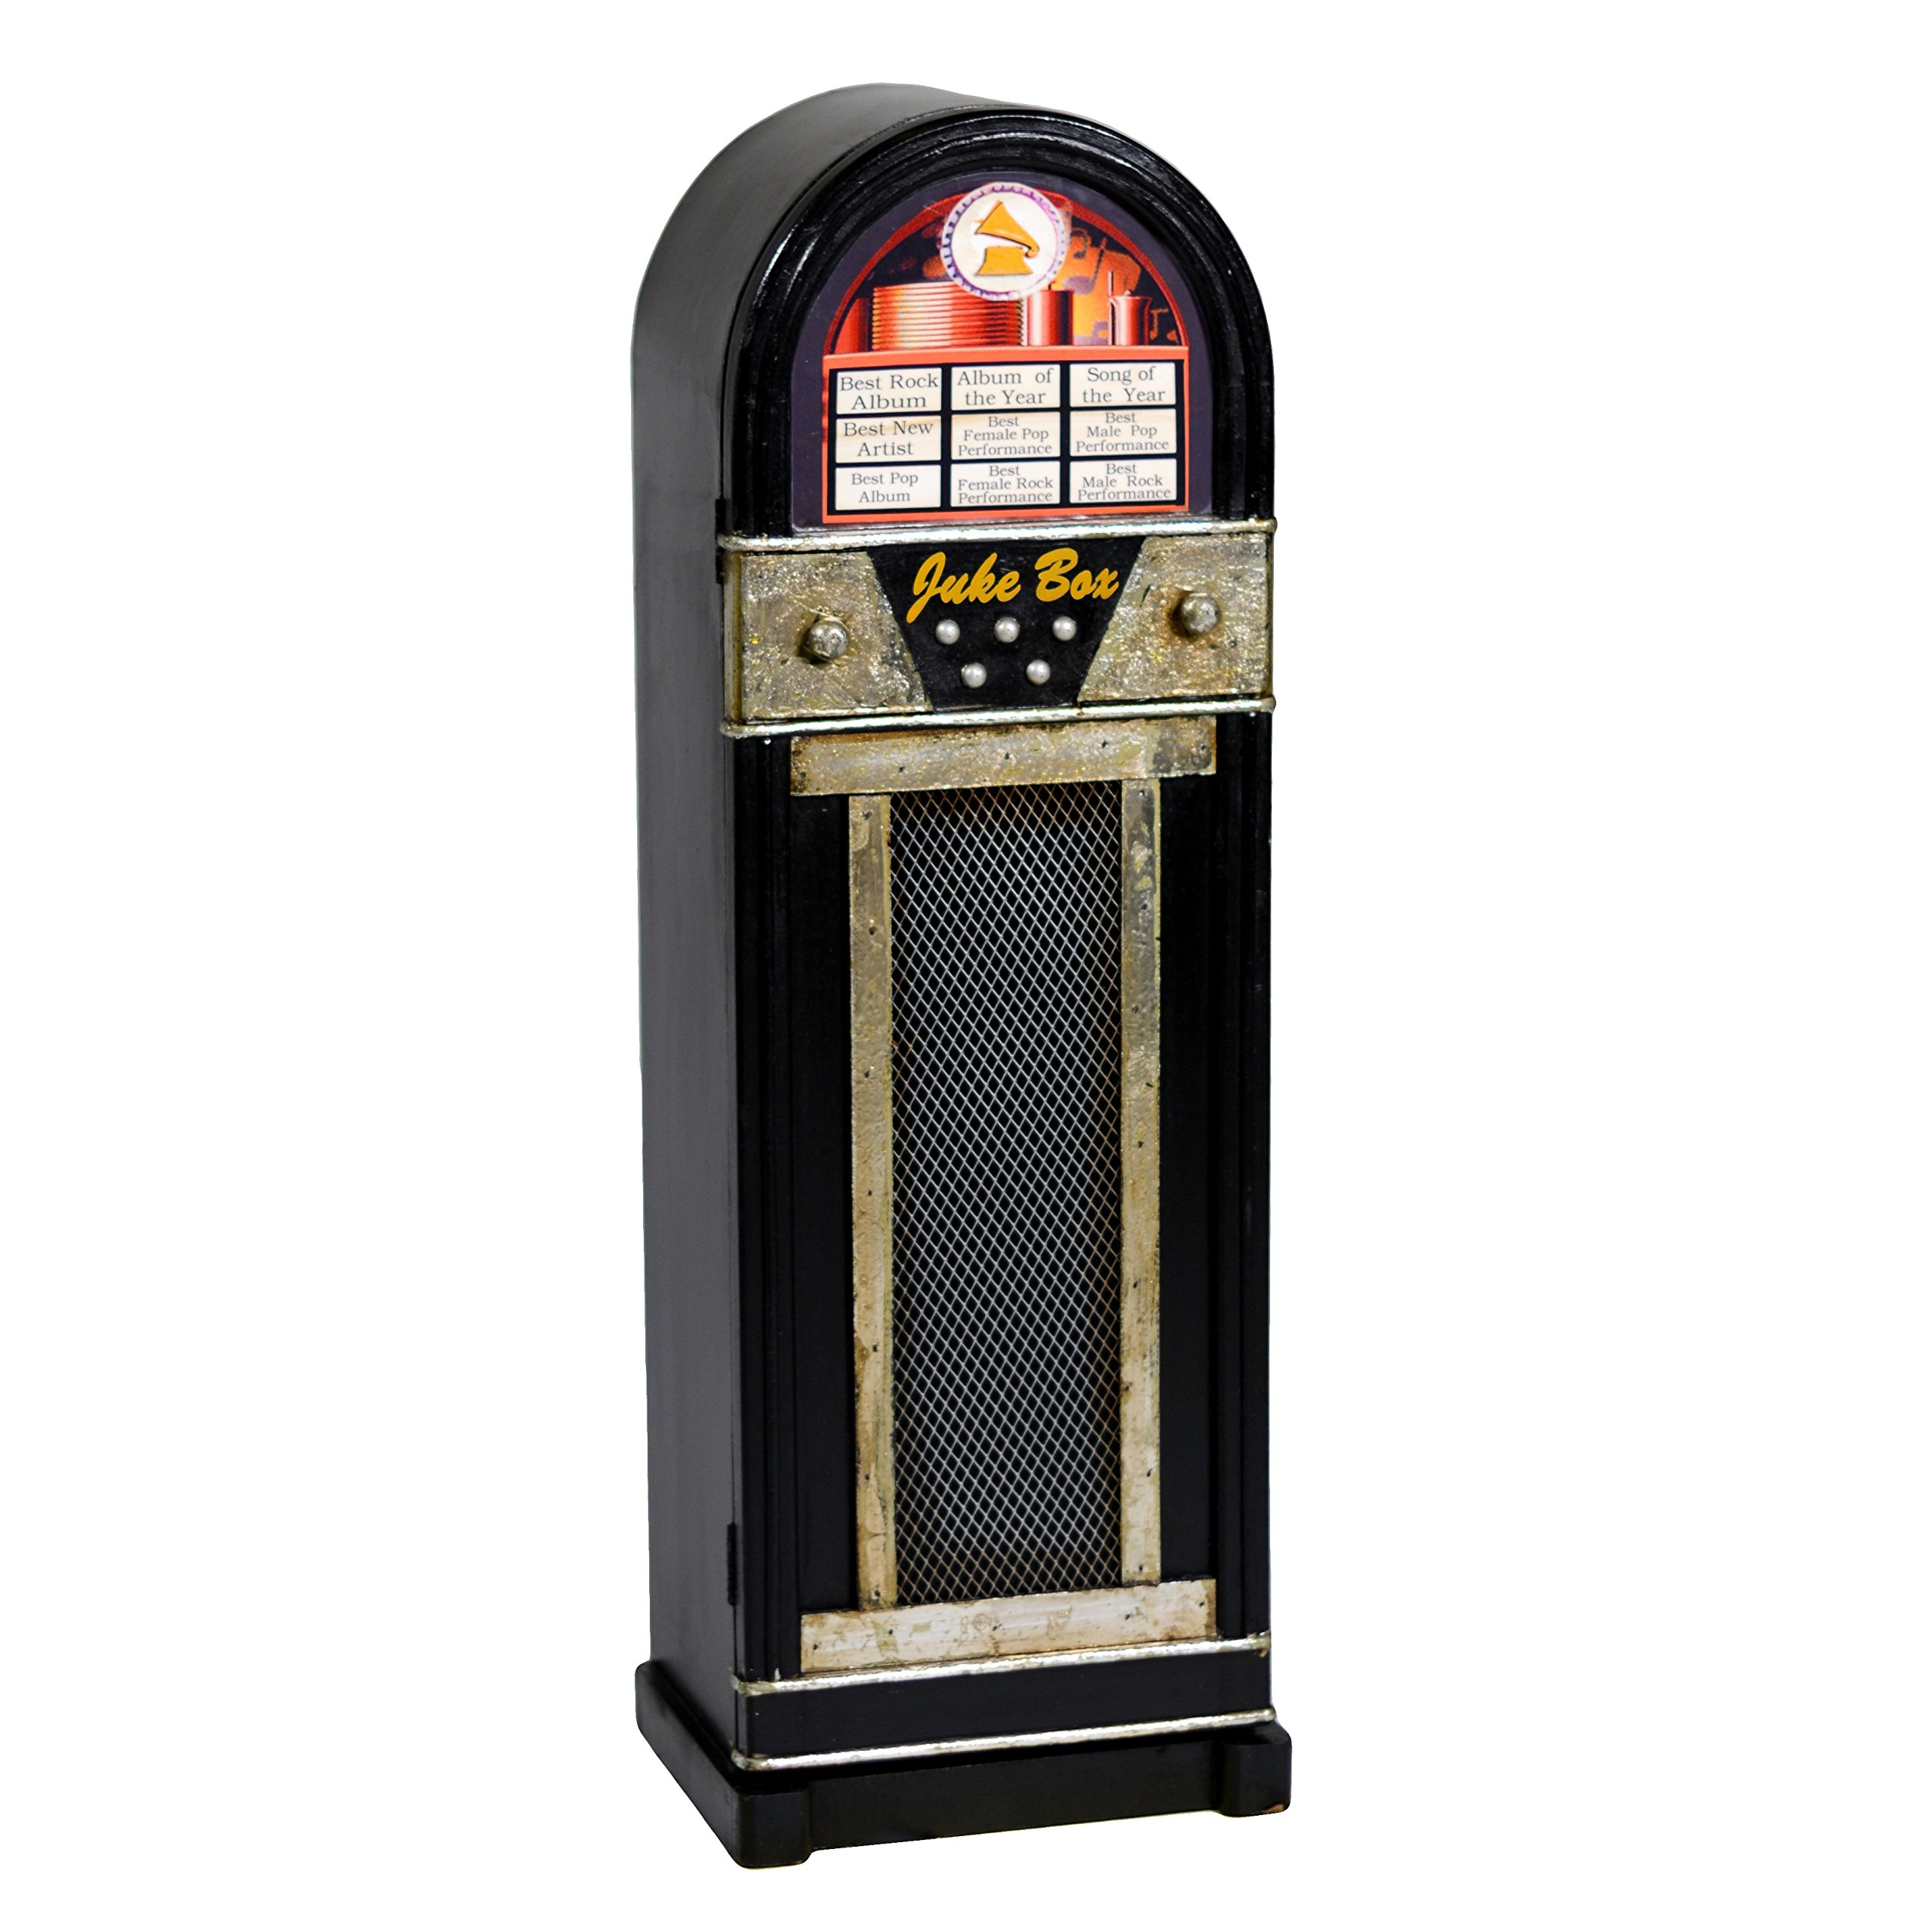 VACCHETTI Joseph 8033760000Juke Box 1Door Cabinet, Wood, Black, 30x 23x 88cm by Vacchetti Giuseppe (Image #1)